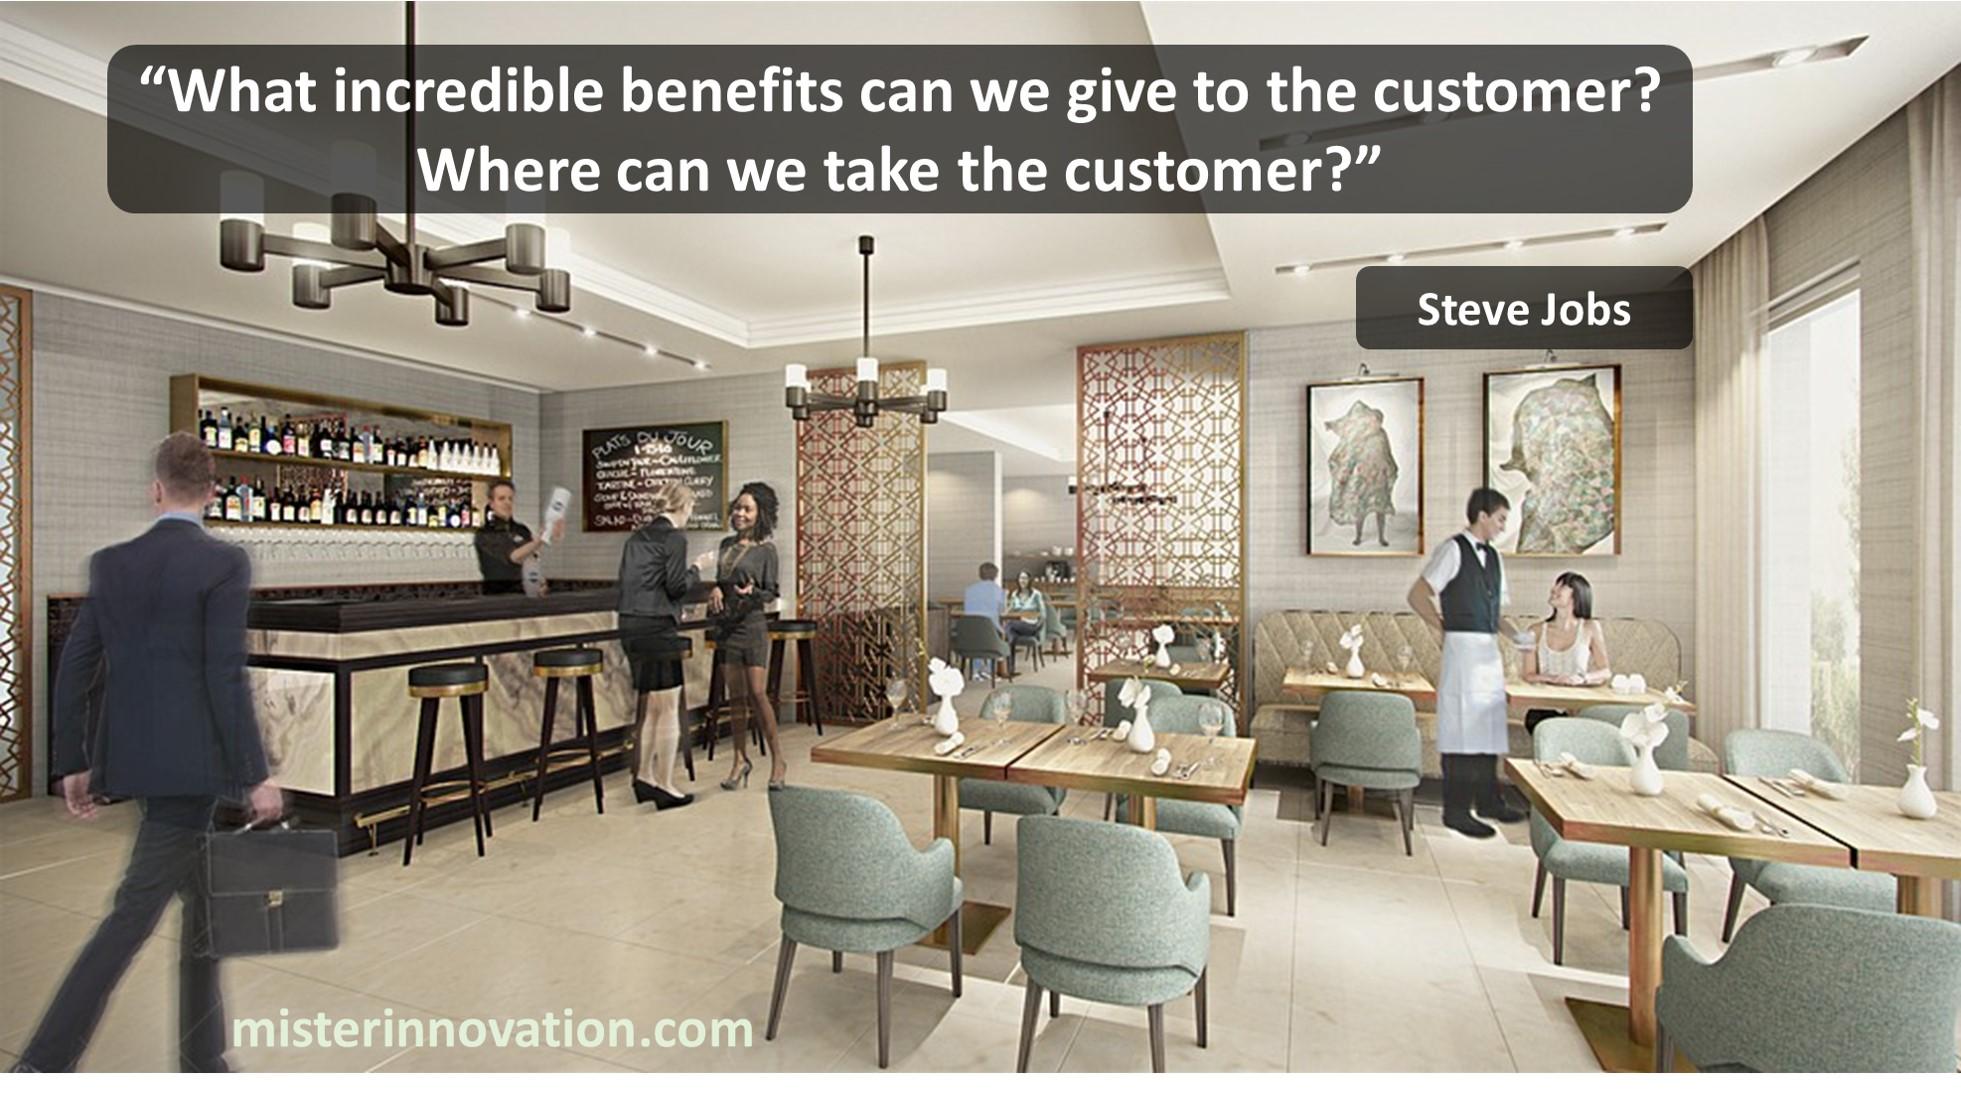 Steve Jobs Customer Benefits